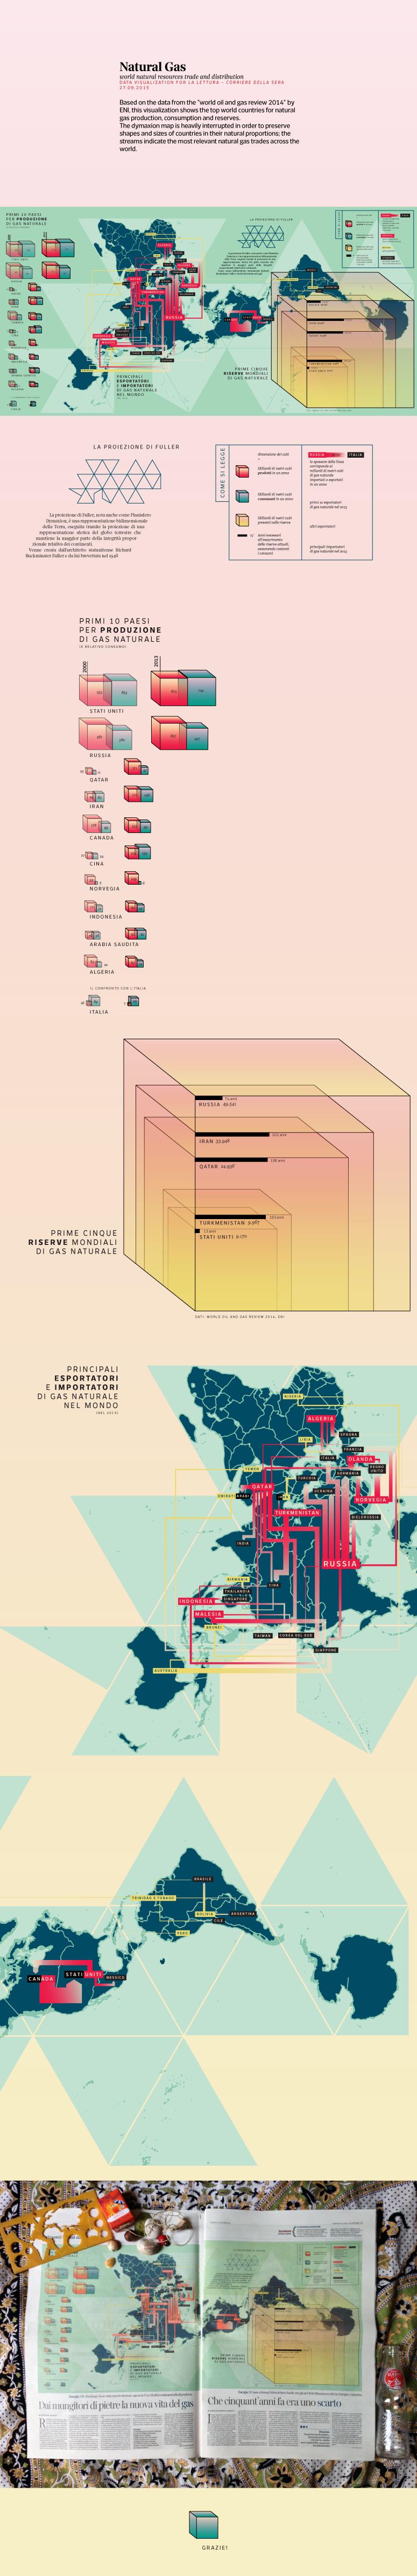 Natural Gas information visualization data visualization dataviz fuller map Gas